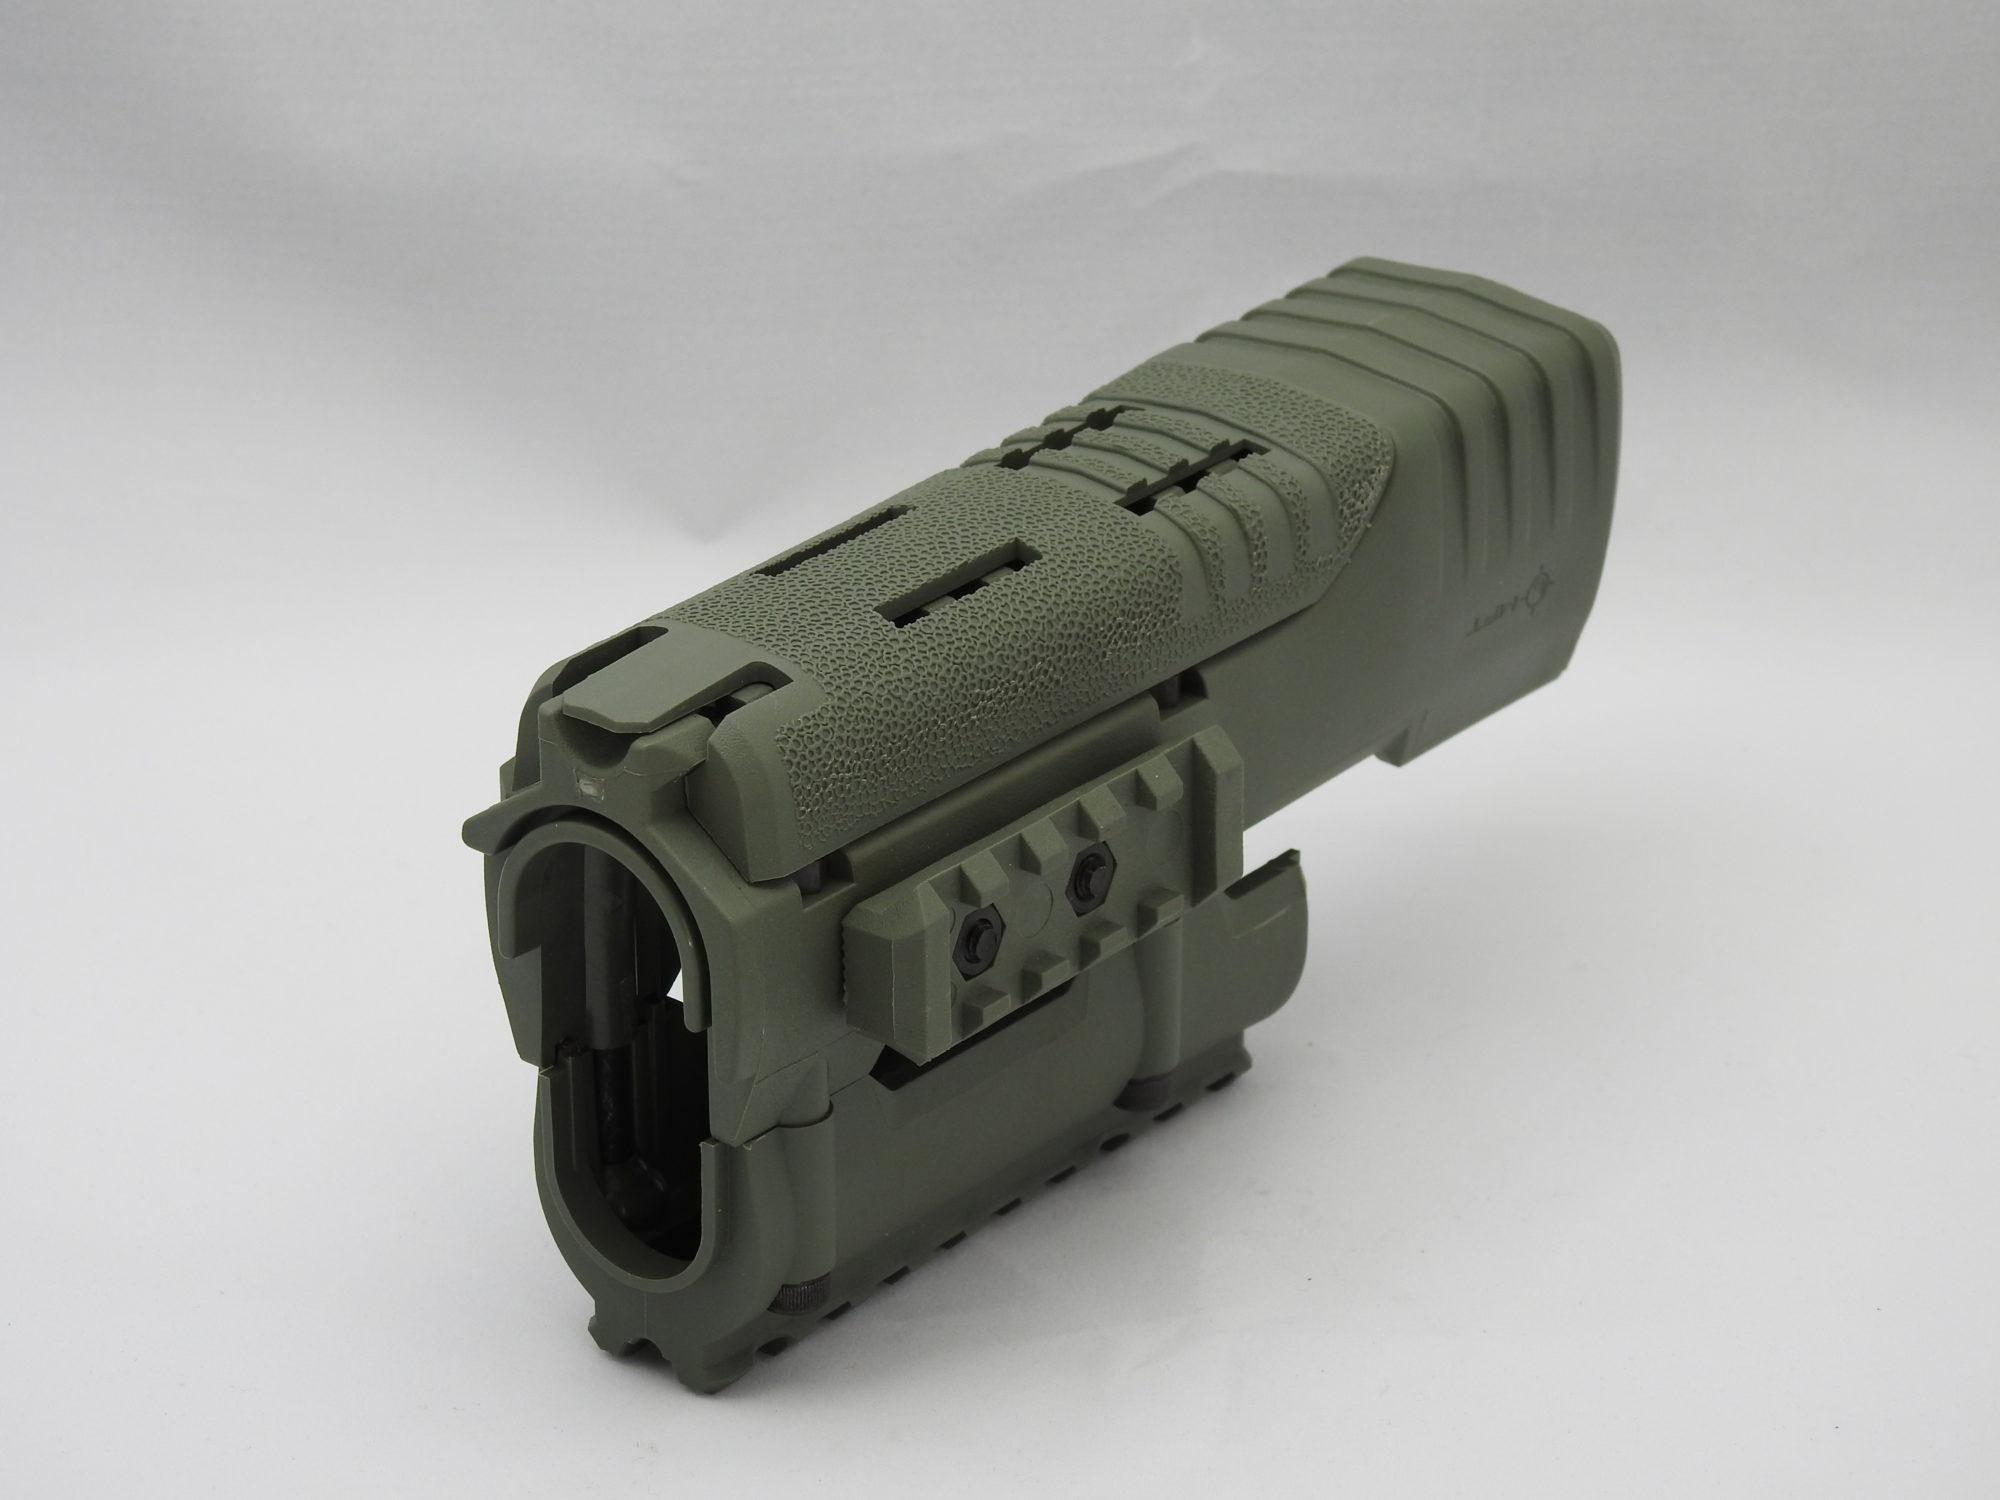 Commercial Firearms Plastic Parts